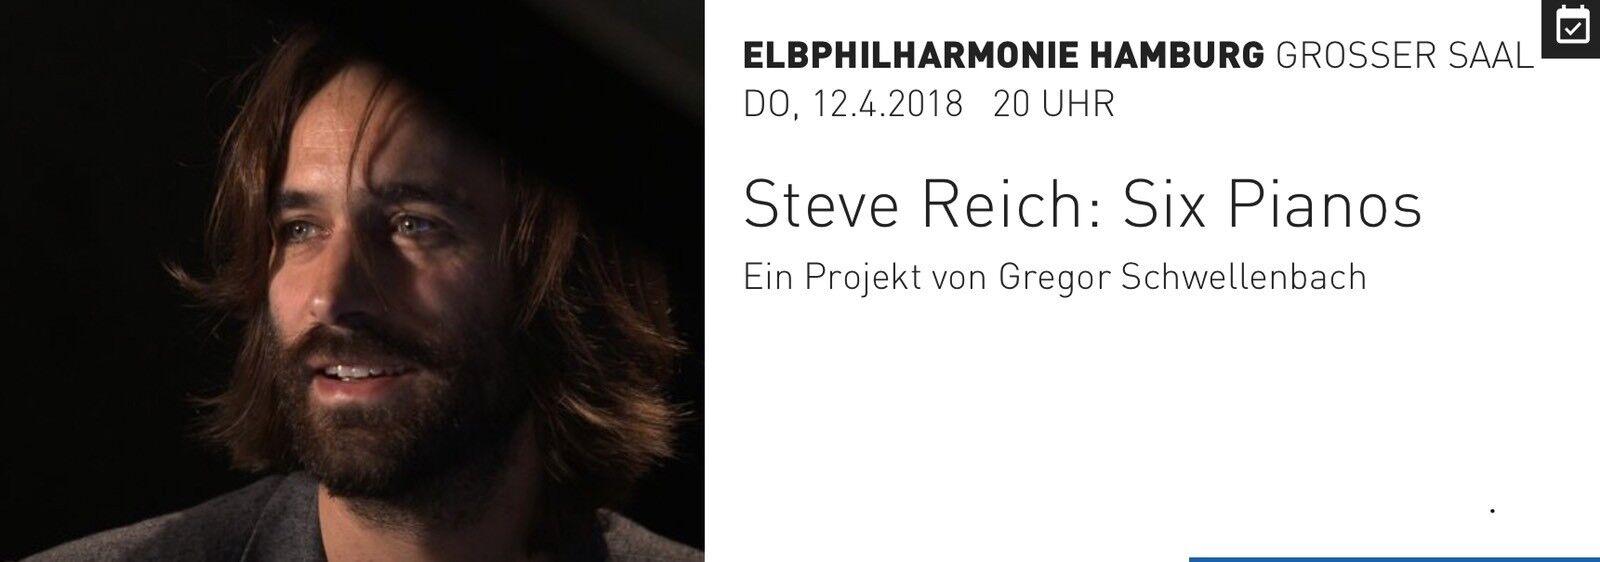 2 x Steve Reich: Six Pianos | Elbphilharmonie - Großer Saal | 12.04.2018